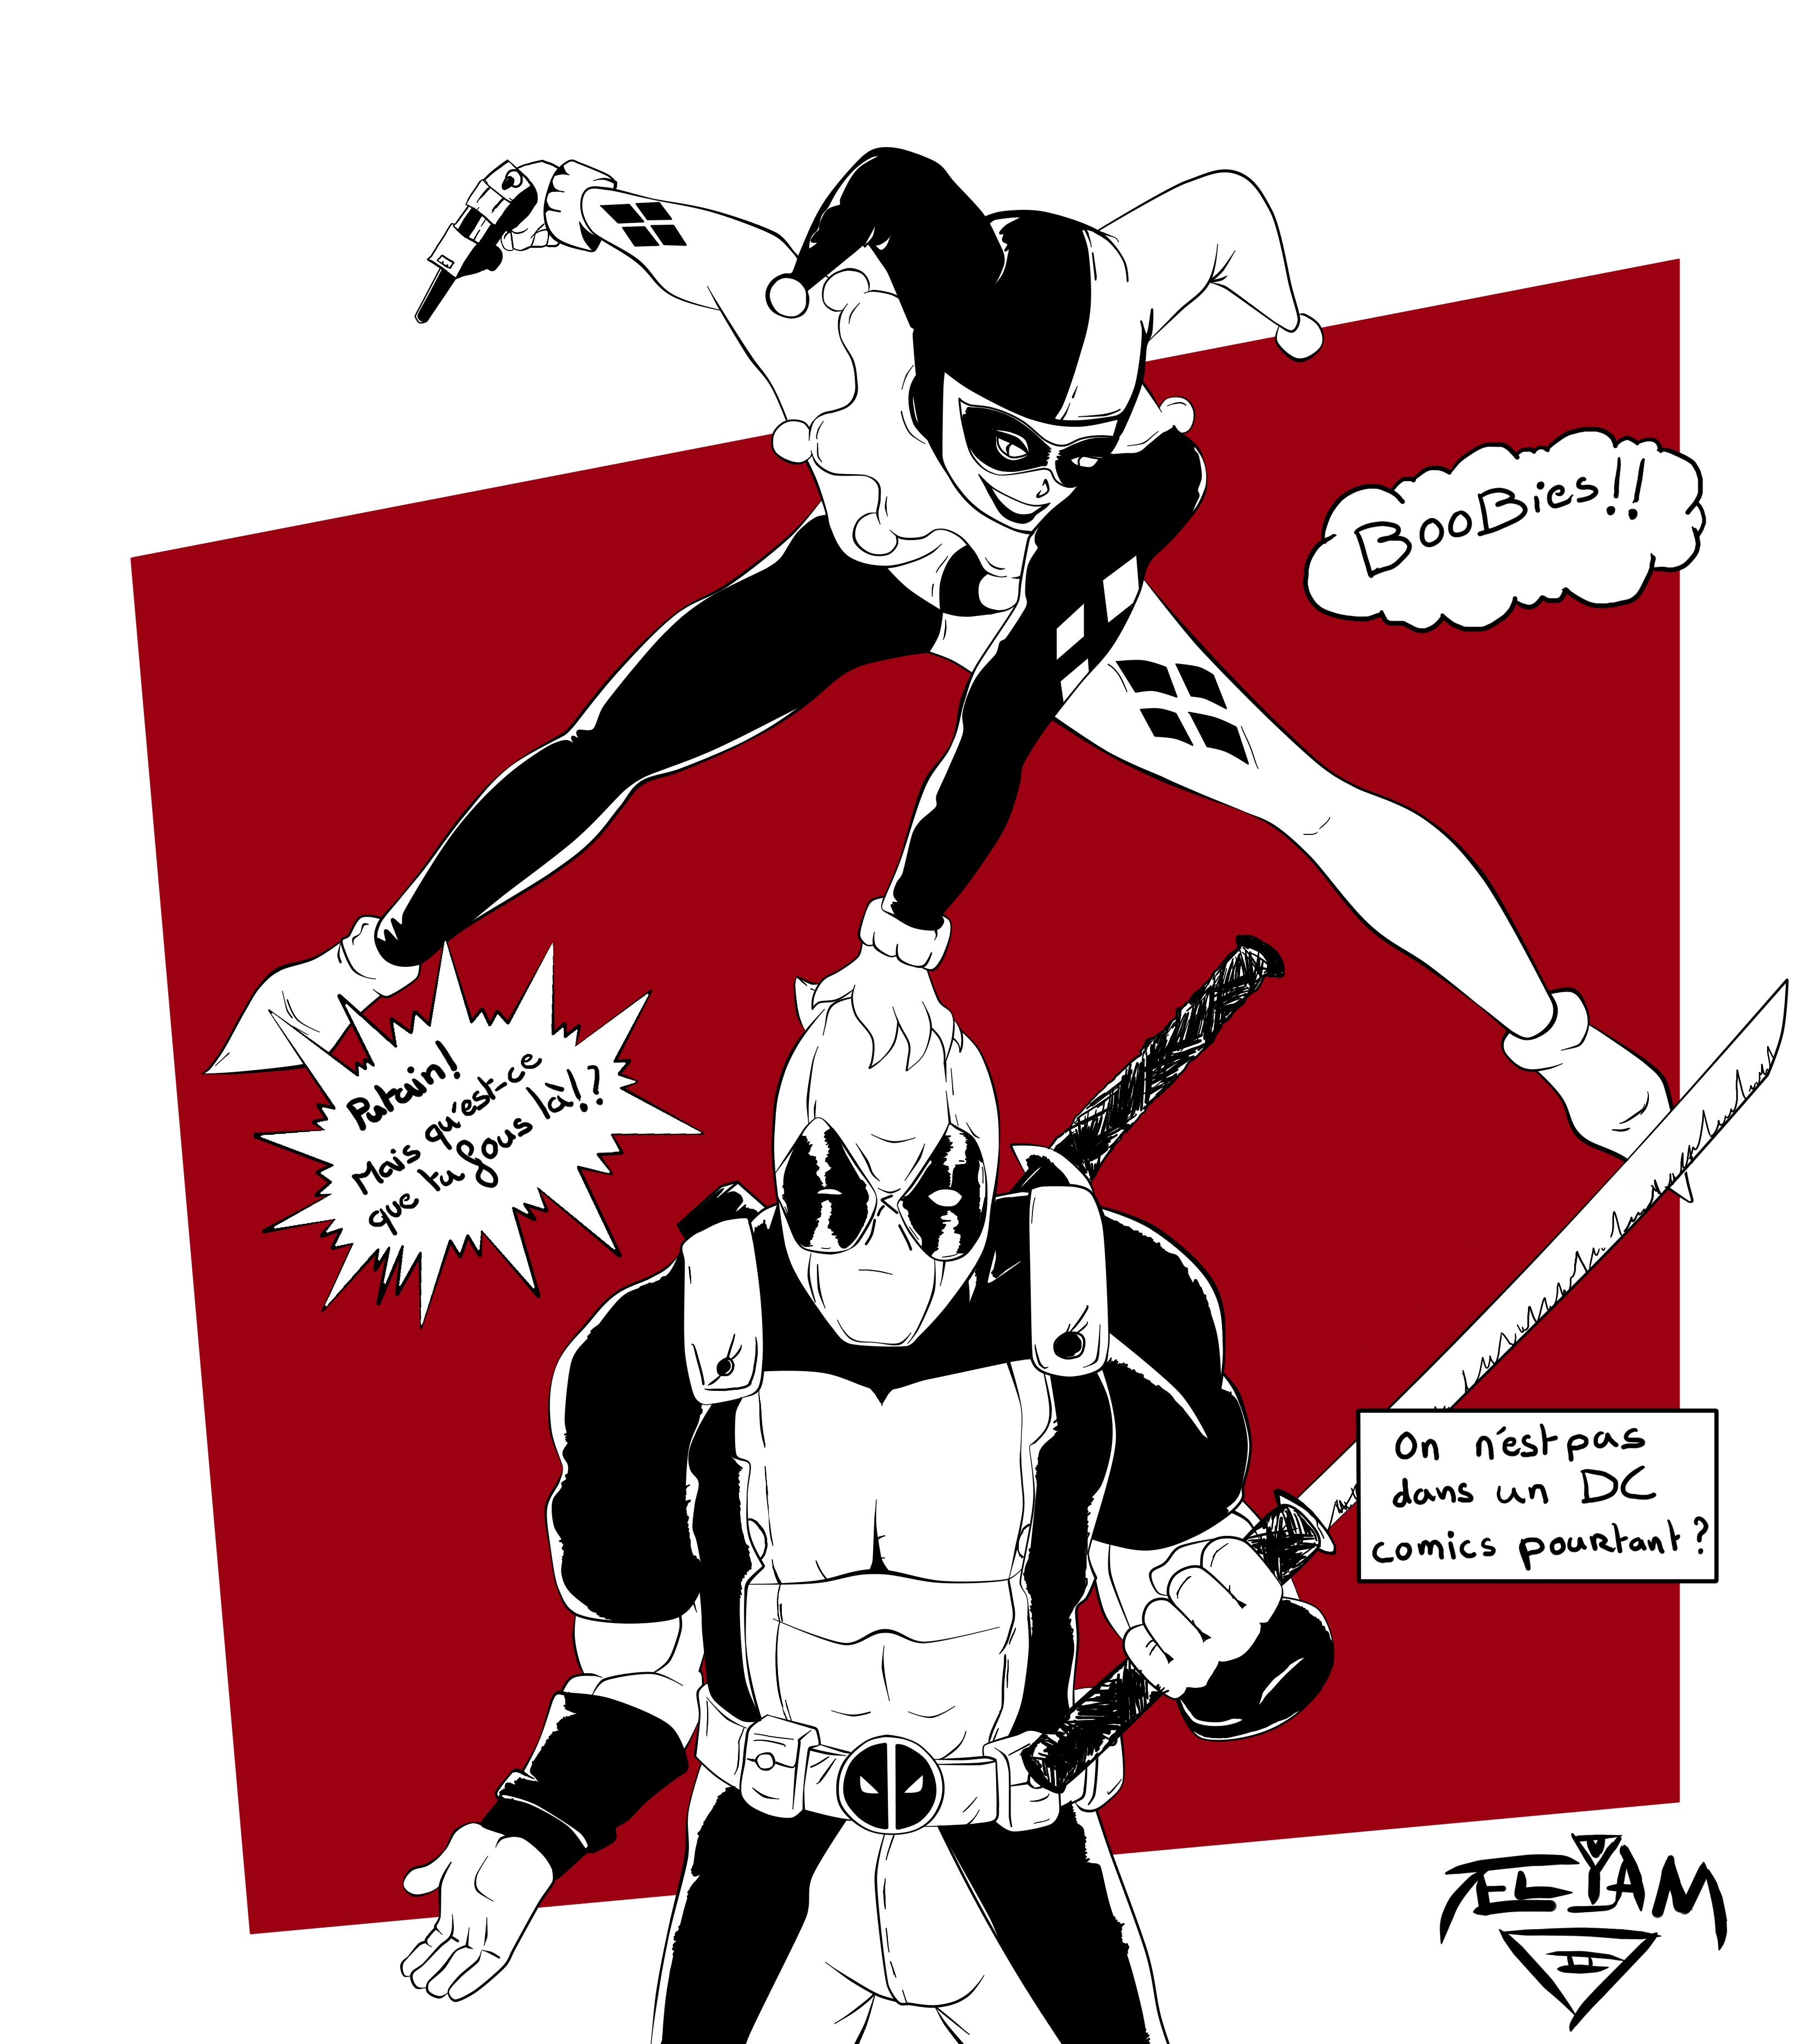 Deadpool x harley quinn by eliamlamb on deviantart - Deadpool harley quinn notebook ...